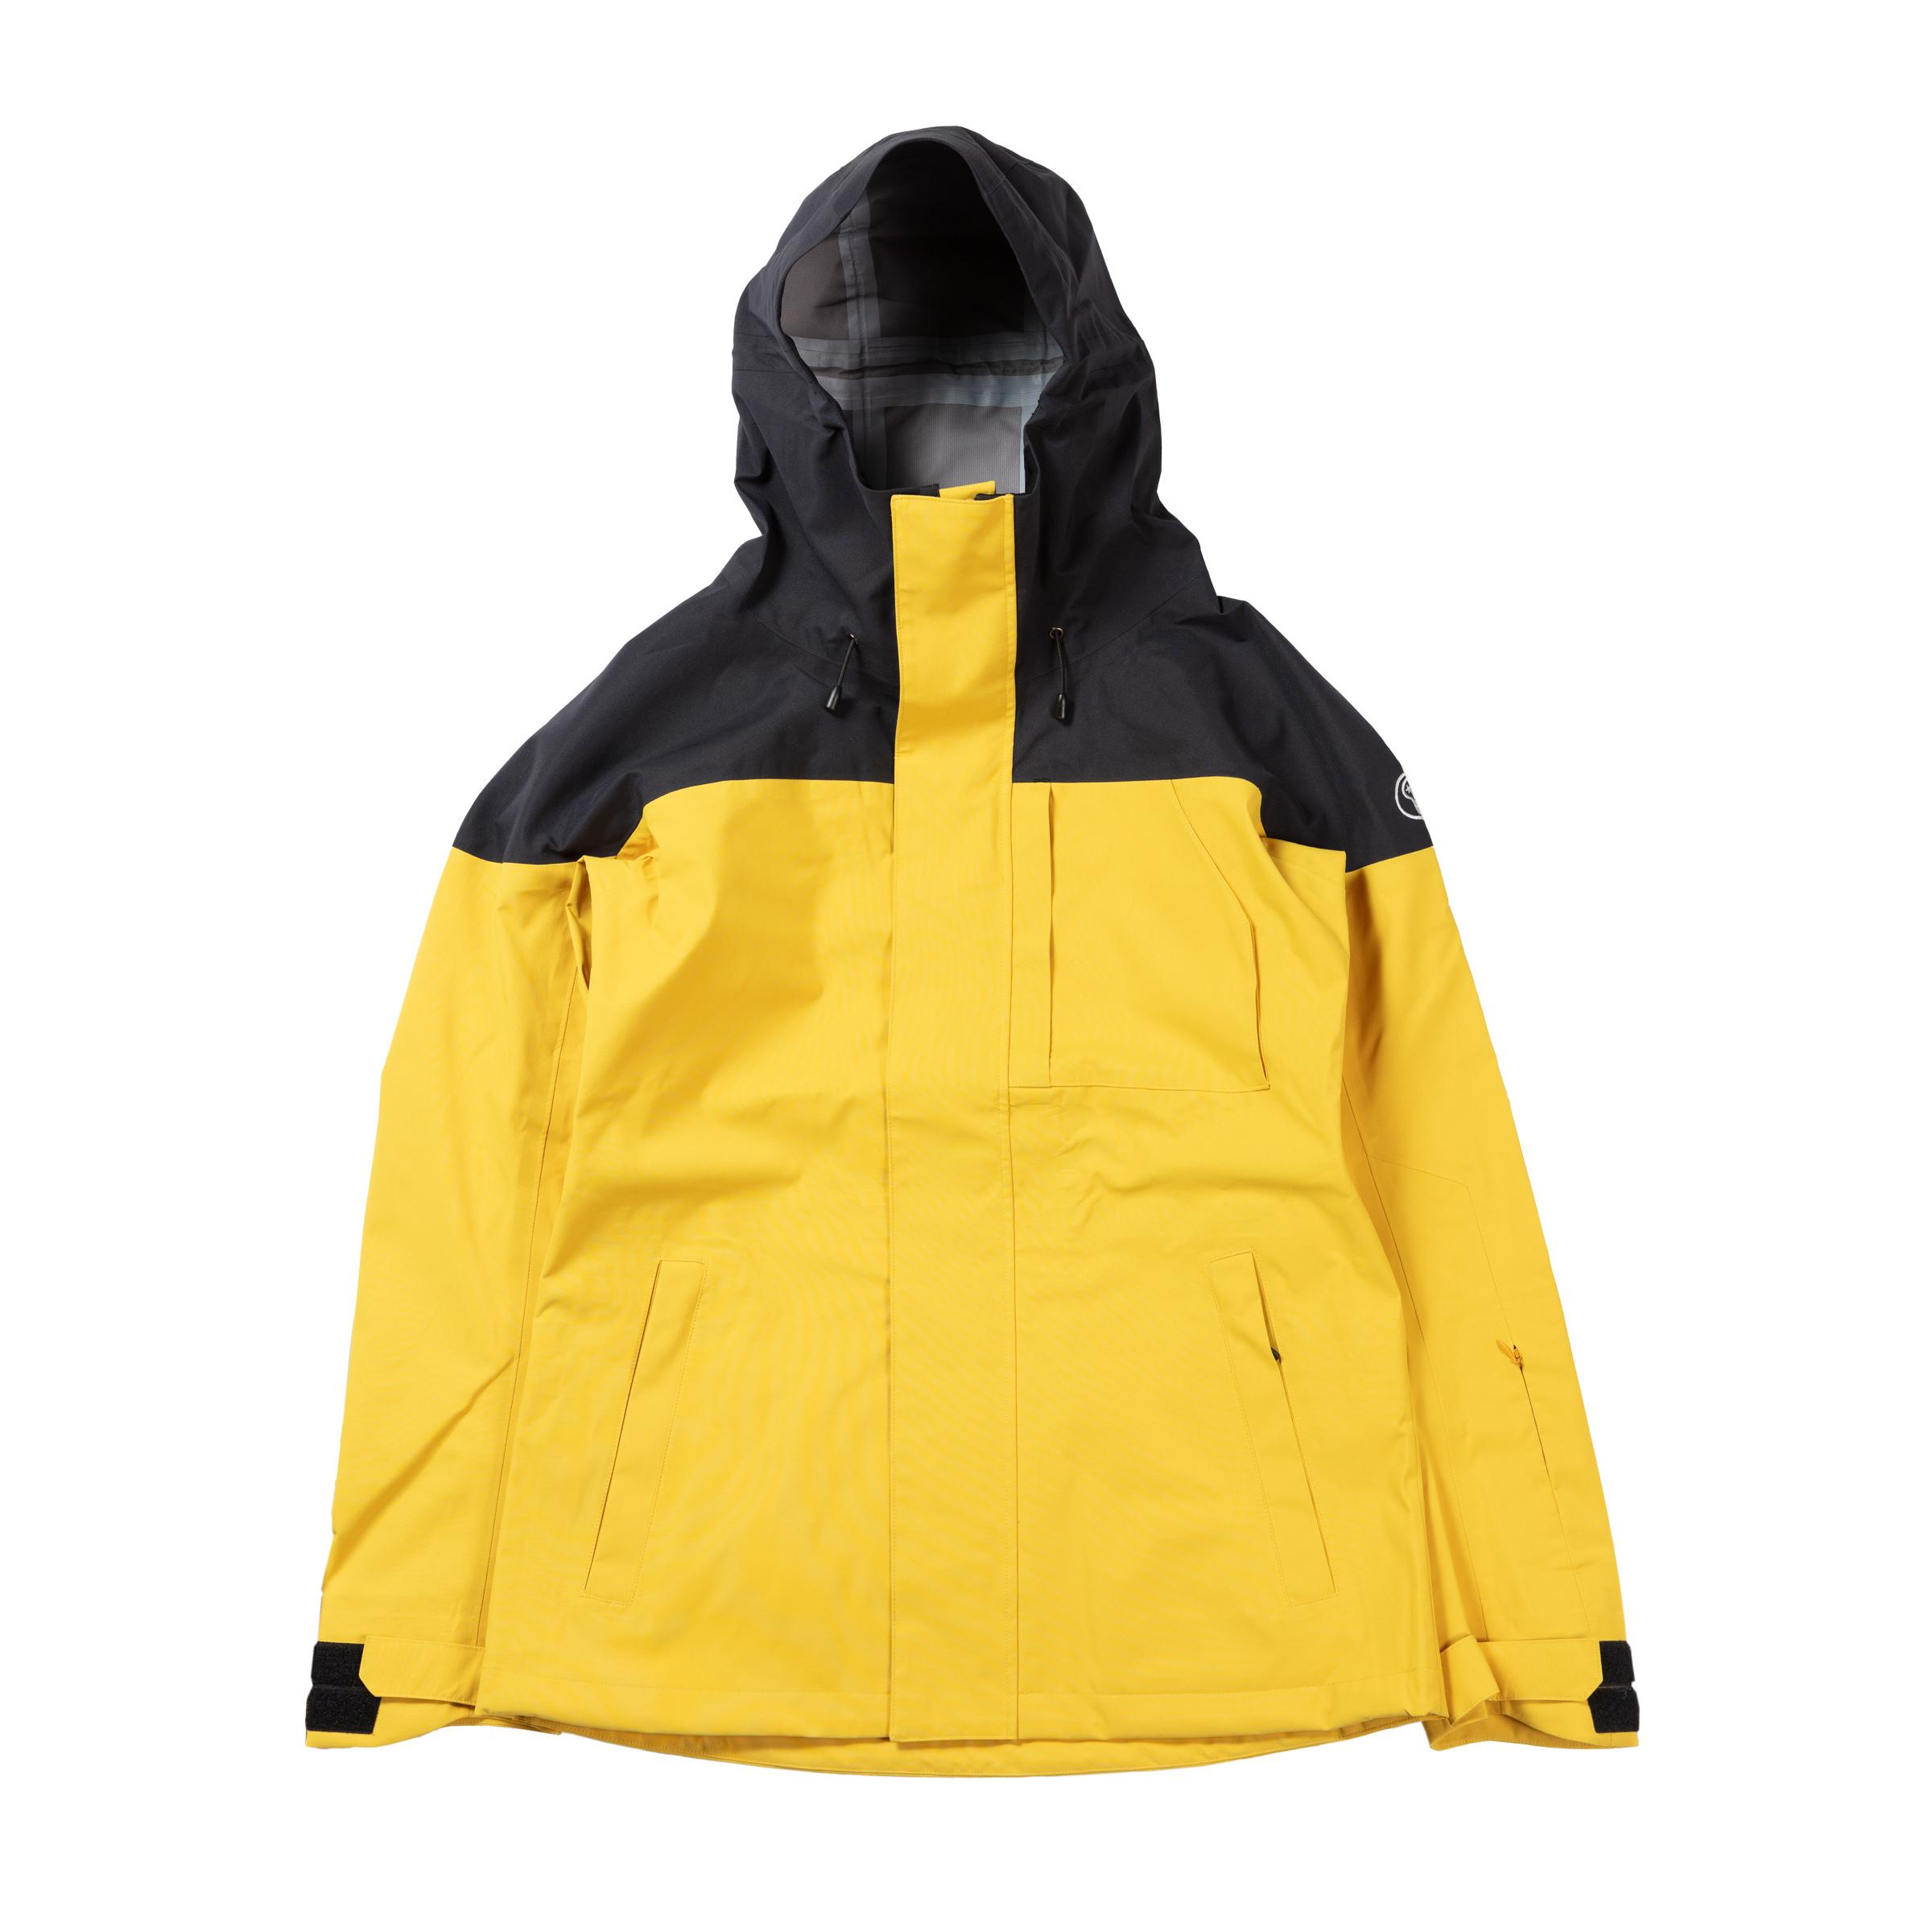 2021unfudge snow wear // PEEP JACKET // YELLOW / 10月中旬発送